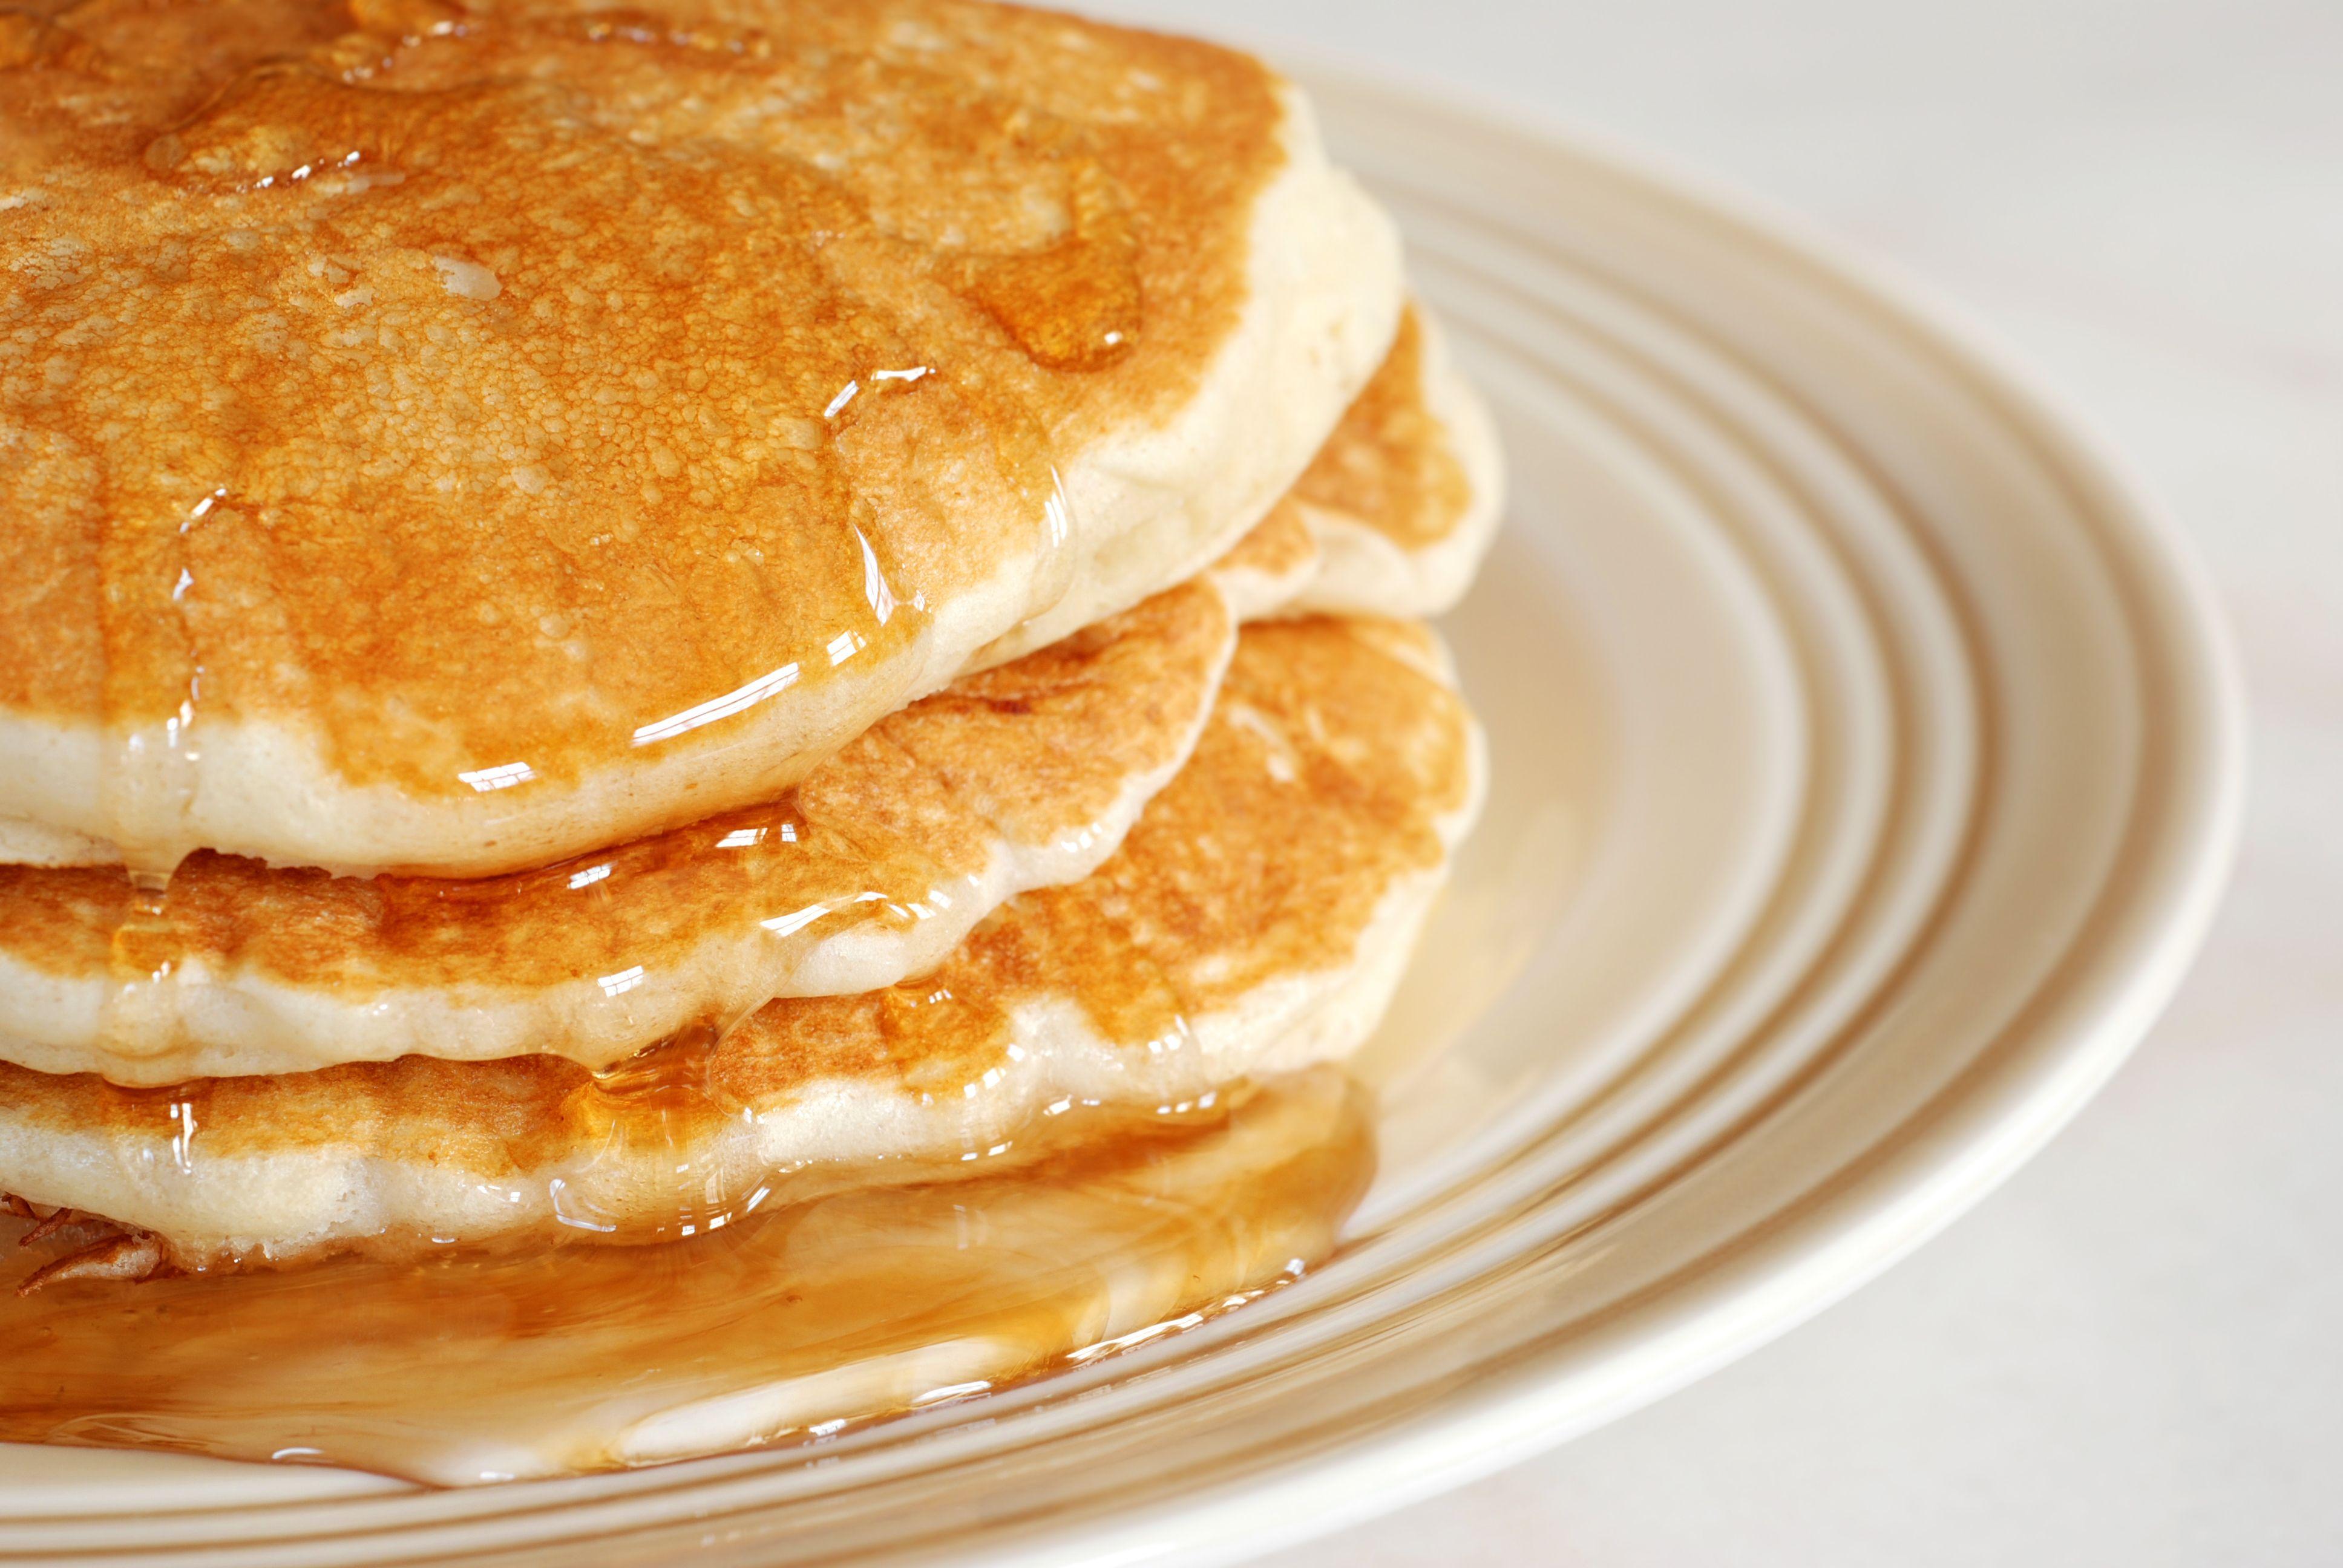 Best Buttermilk Pancakes Ever Recipe Buttermilk Pancakes Pancakes And Bacon Food